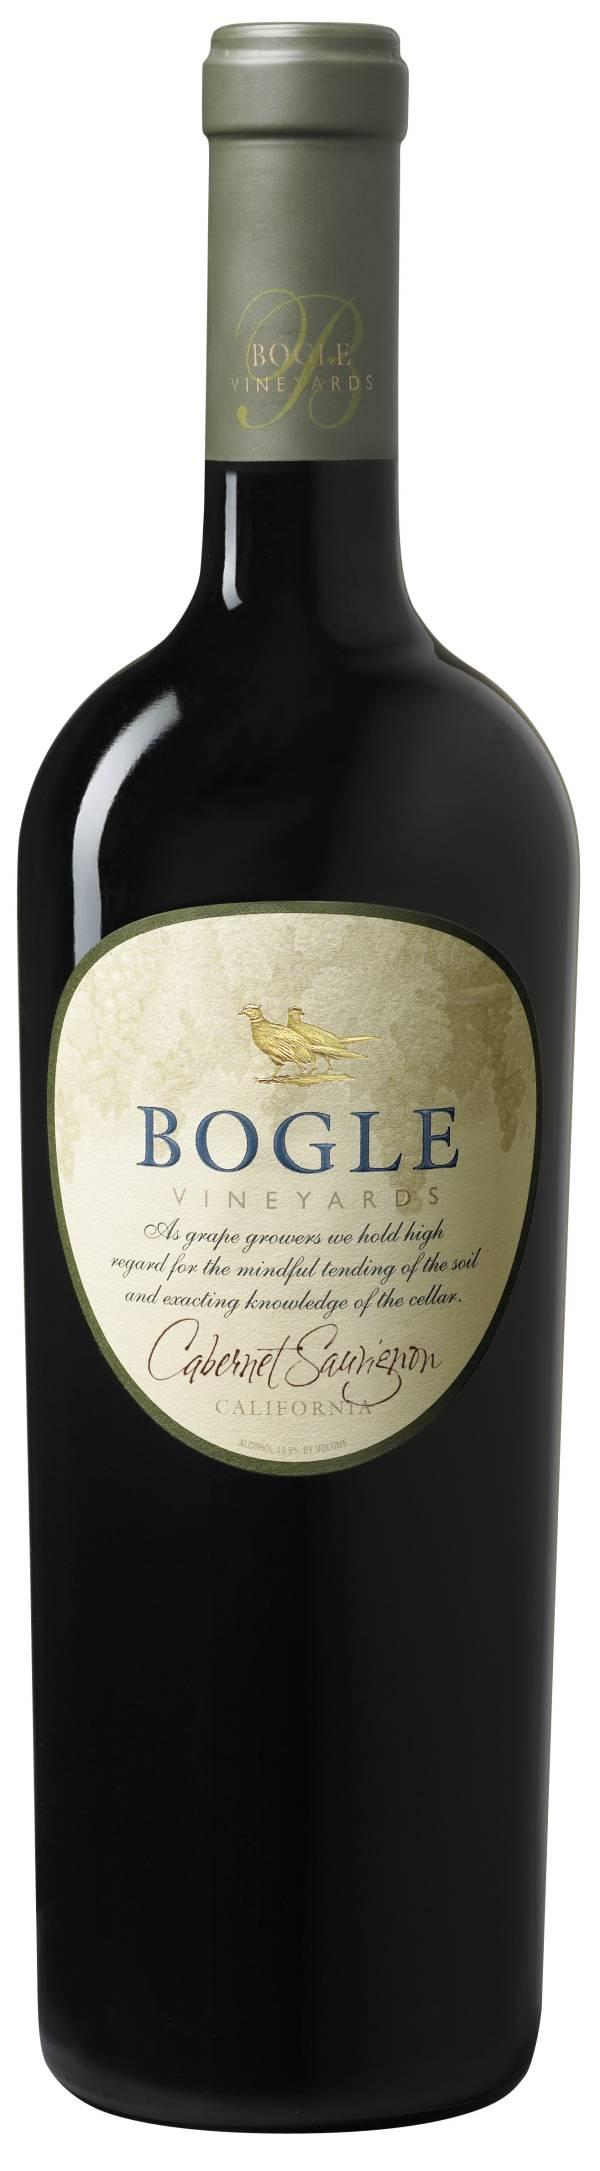 Bogle Cabernet - 750ml